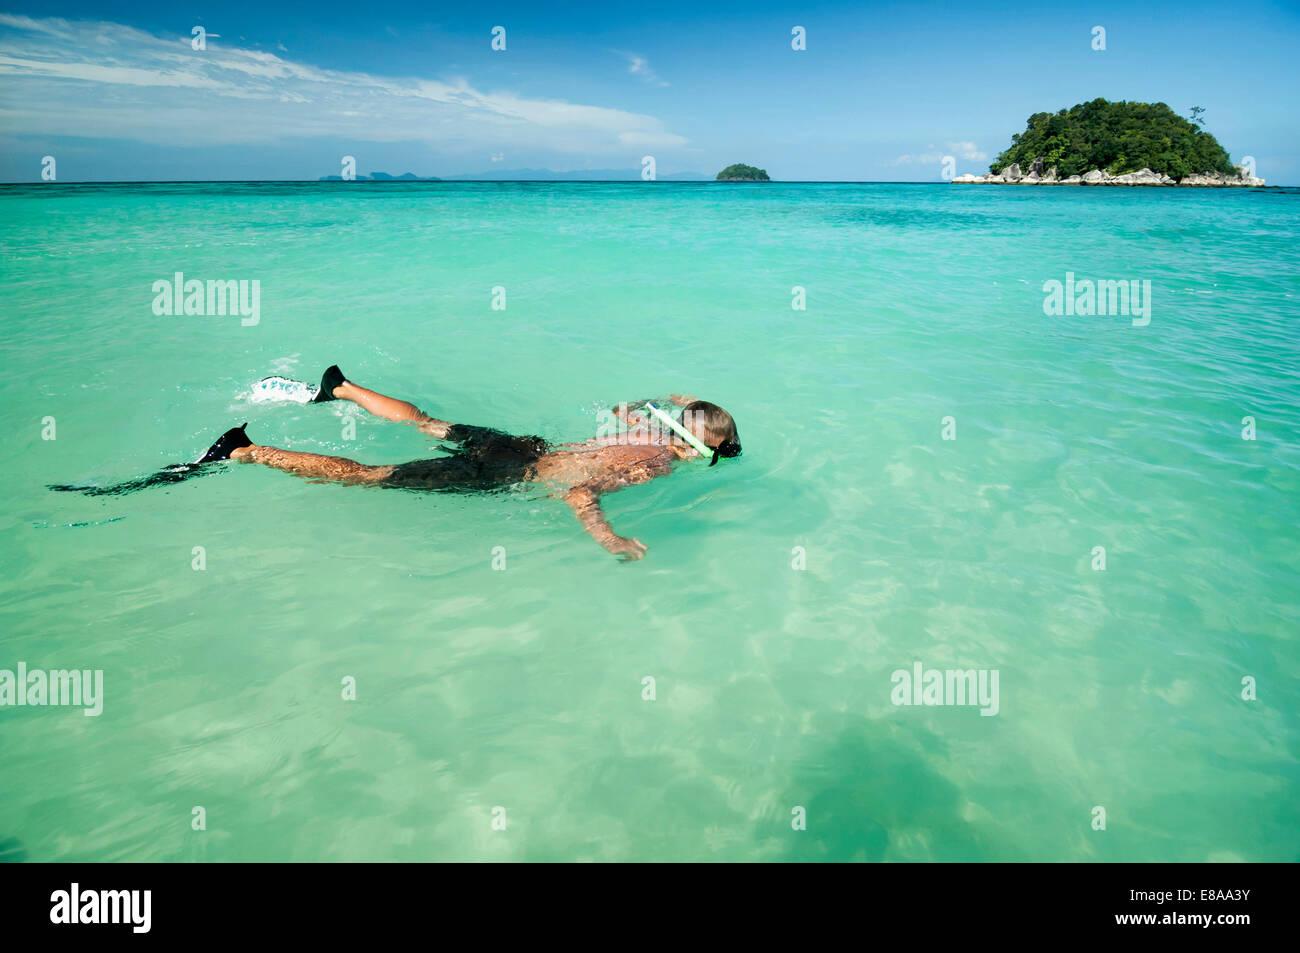 teenage boy snorkeling, Koh Lipe, Thailand - Stock Image